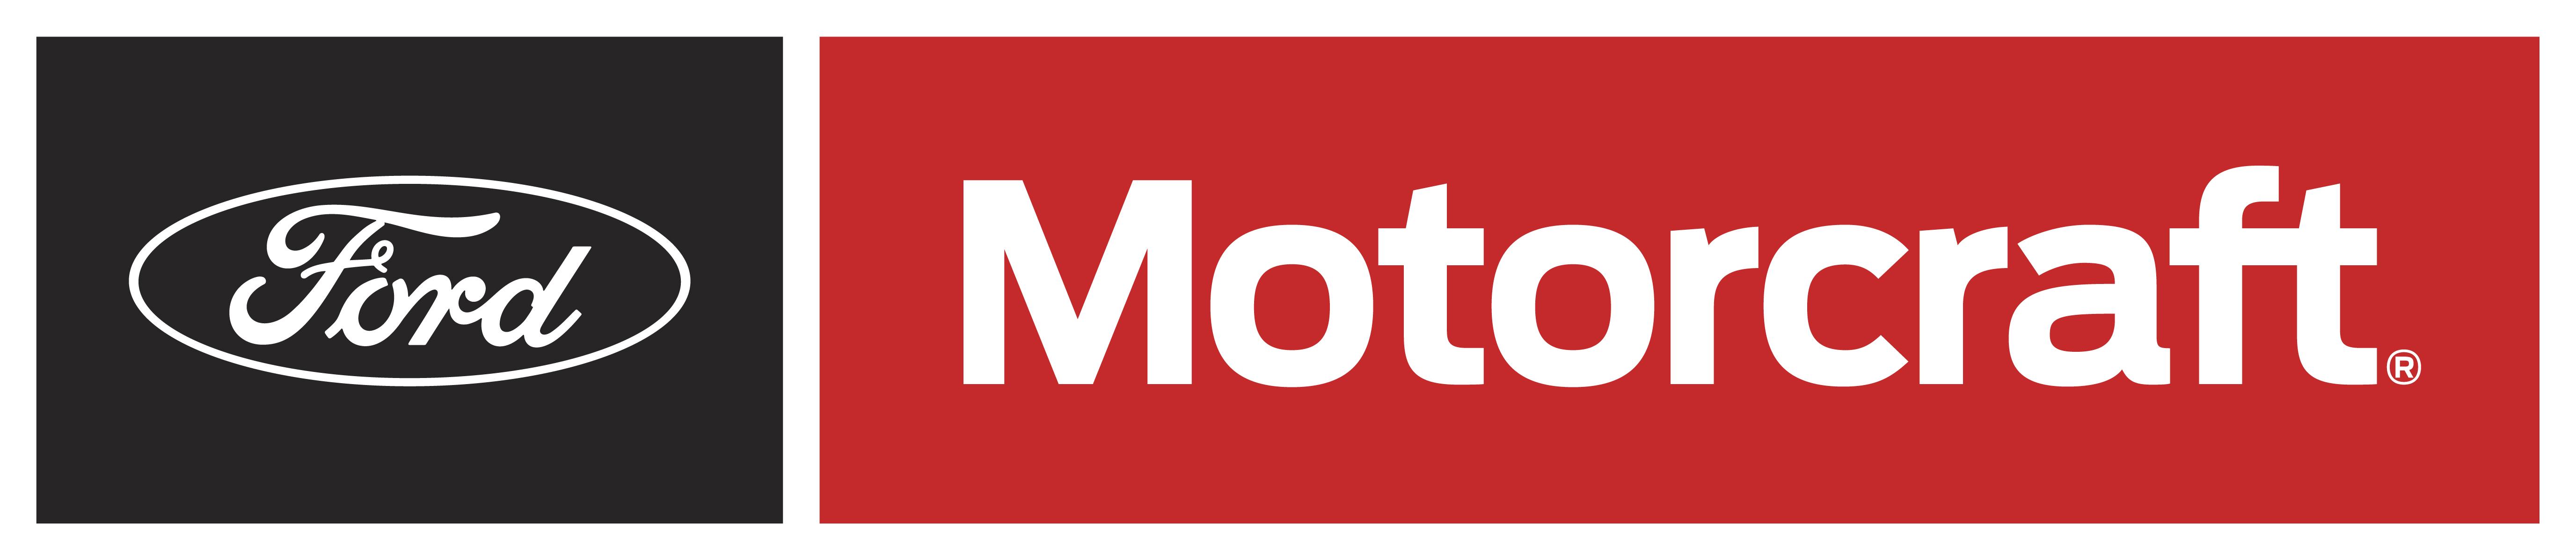 ford-motorcraft